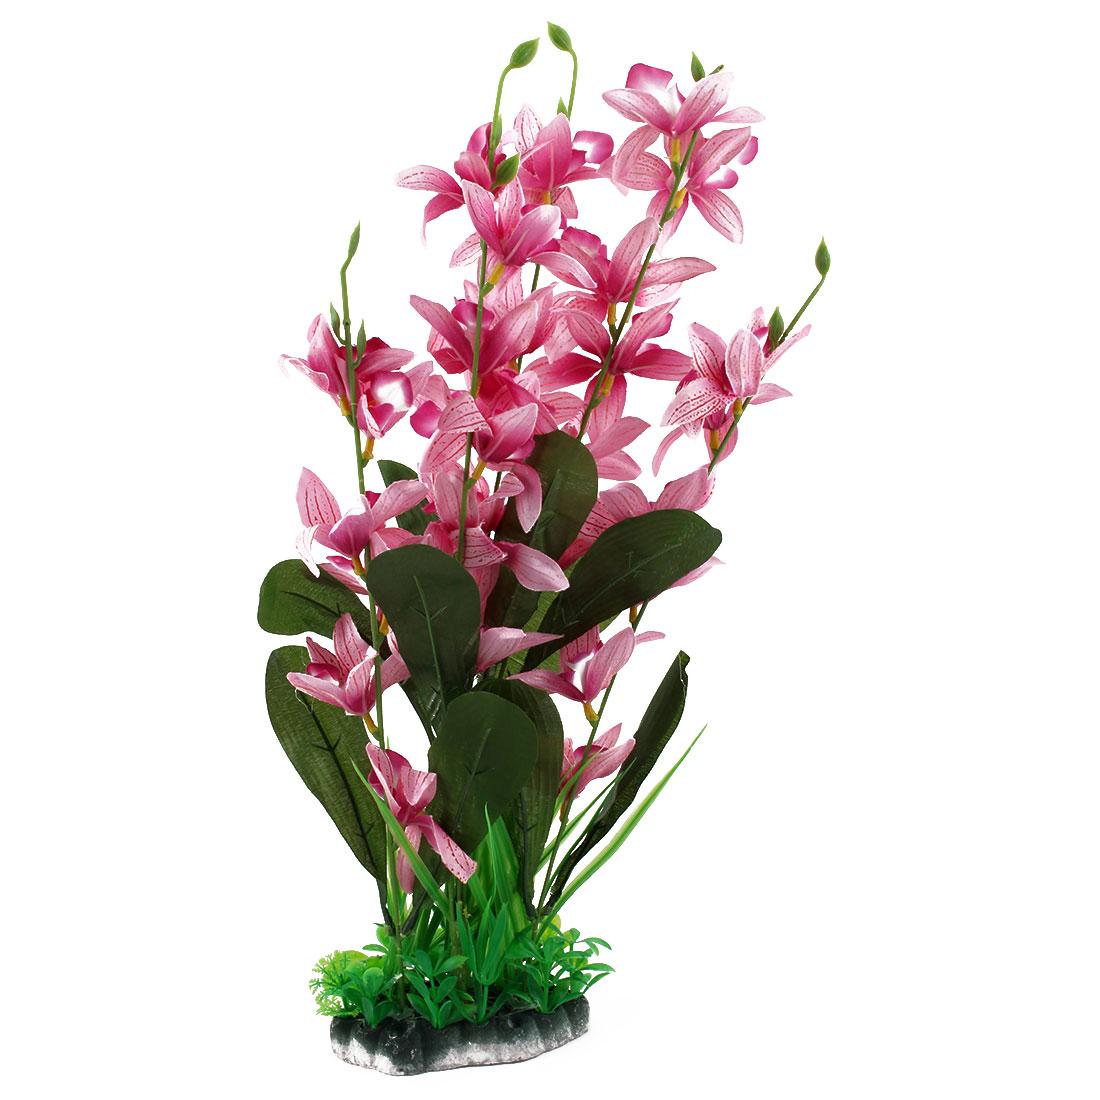 Fish Tank Aquarium Plastic Emulational Flower Plant Ornament Pink Green